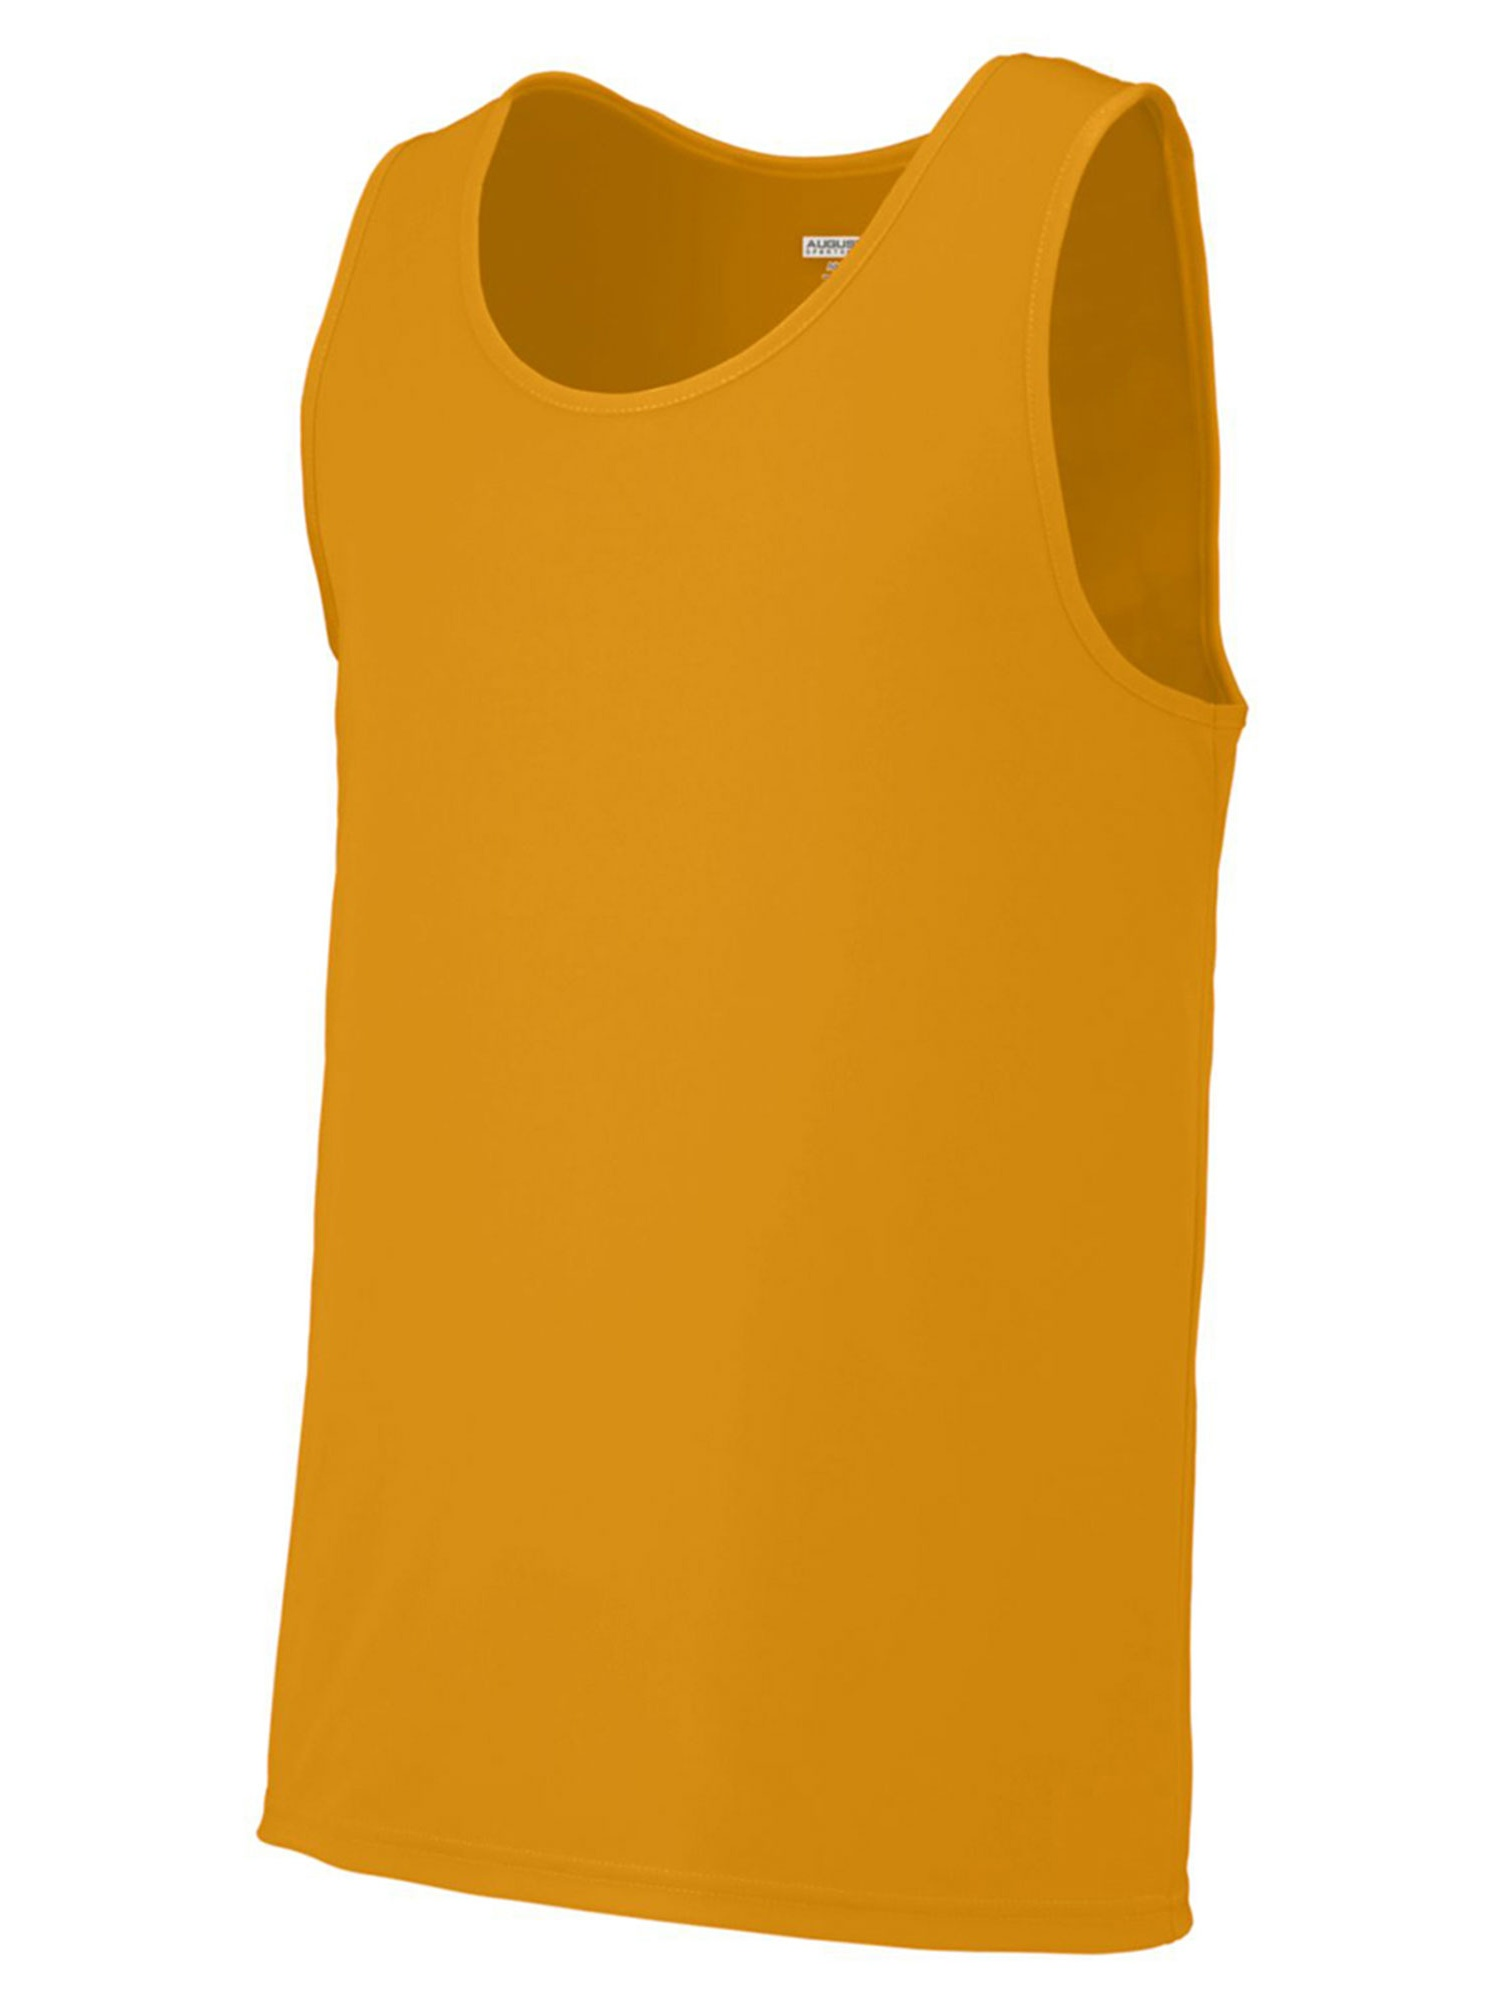 Augusta Sportswear Mens Double Needle Training Tank, Navy, 3XL, Style, 703